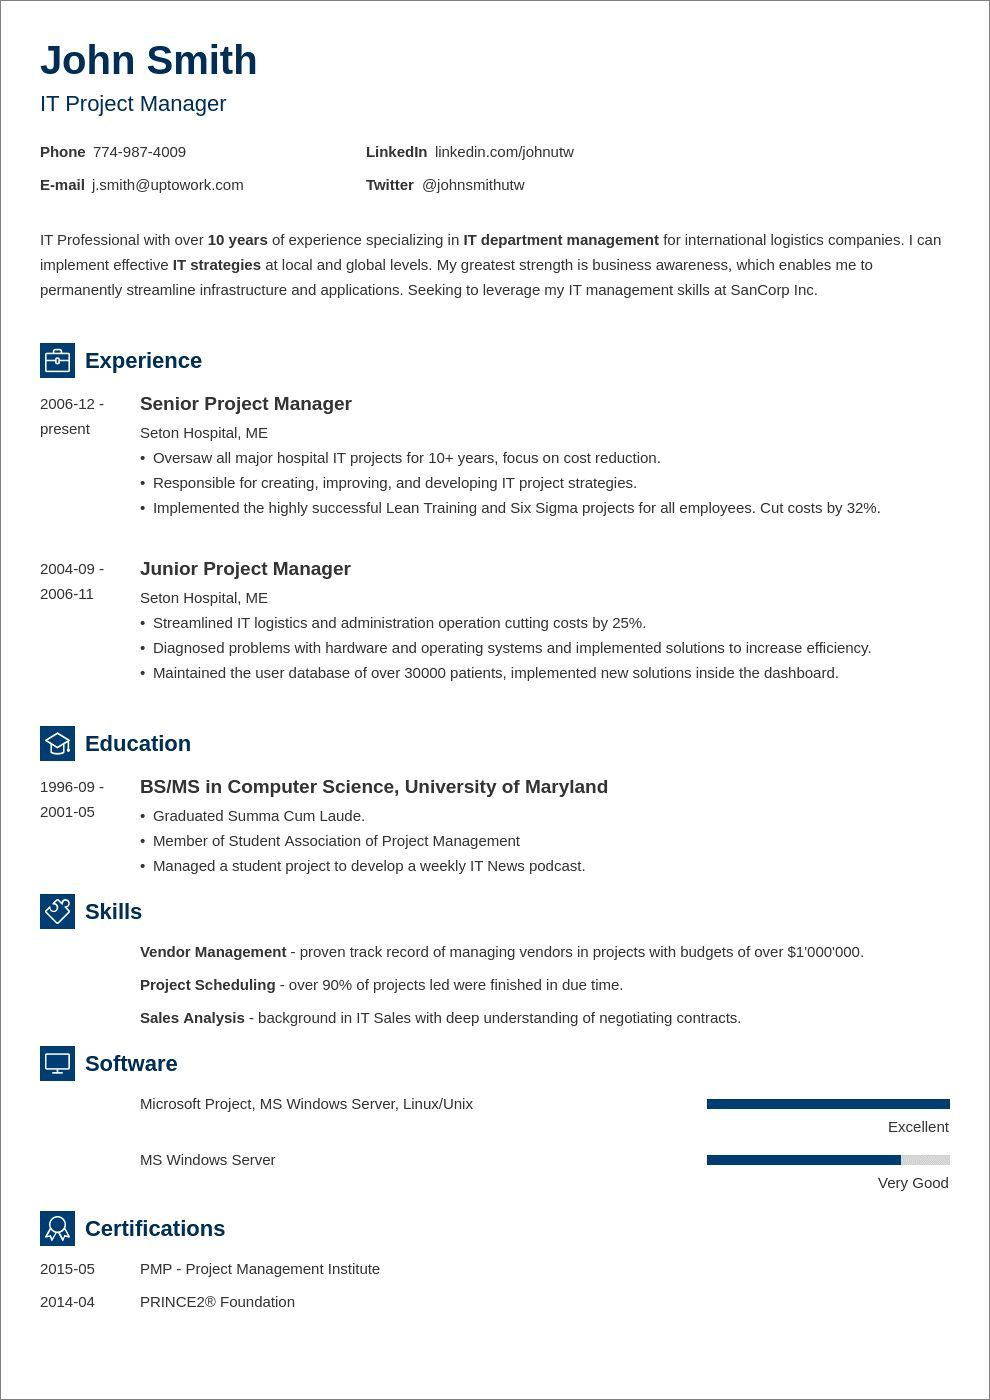 Startups Microsoft Microsoft Word Free Microsoft Office Word Microsoft Word Hacks In 2020 Microsoft Word Free Microsoft Word Resume Template Resume Template Word